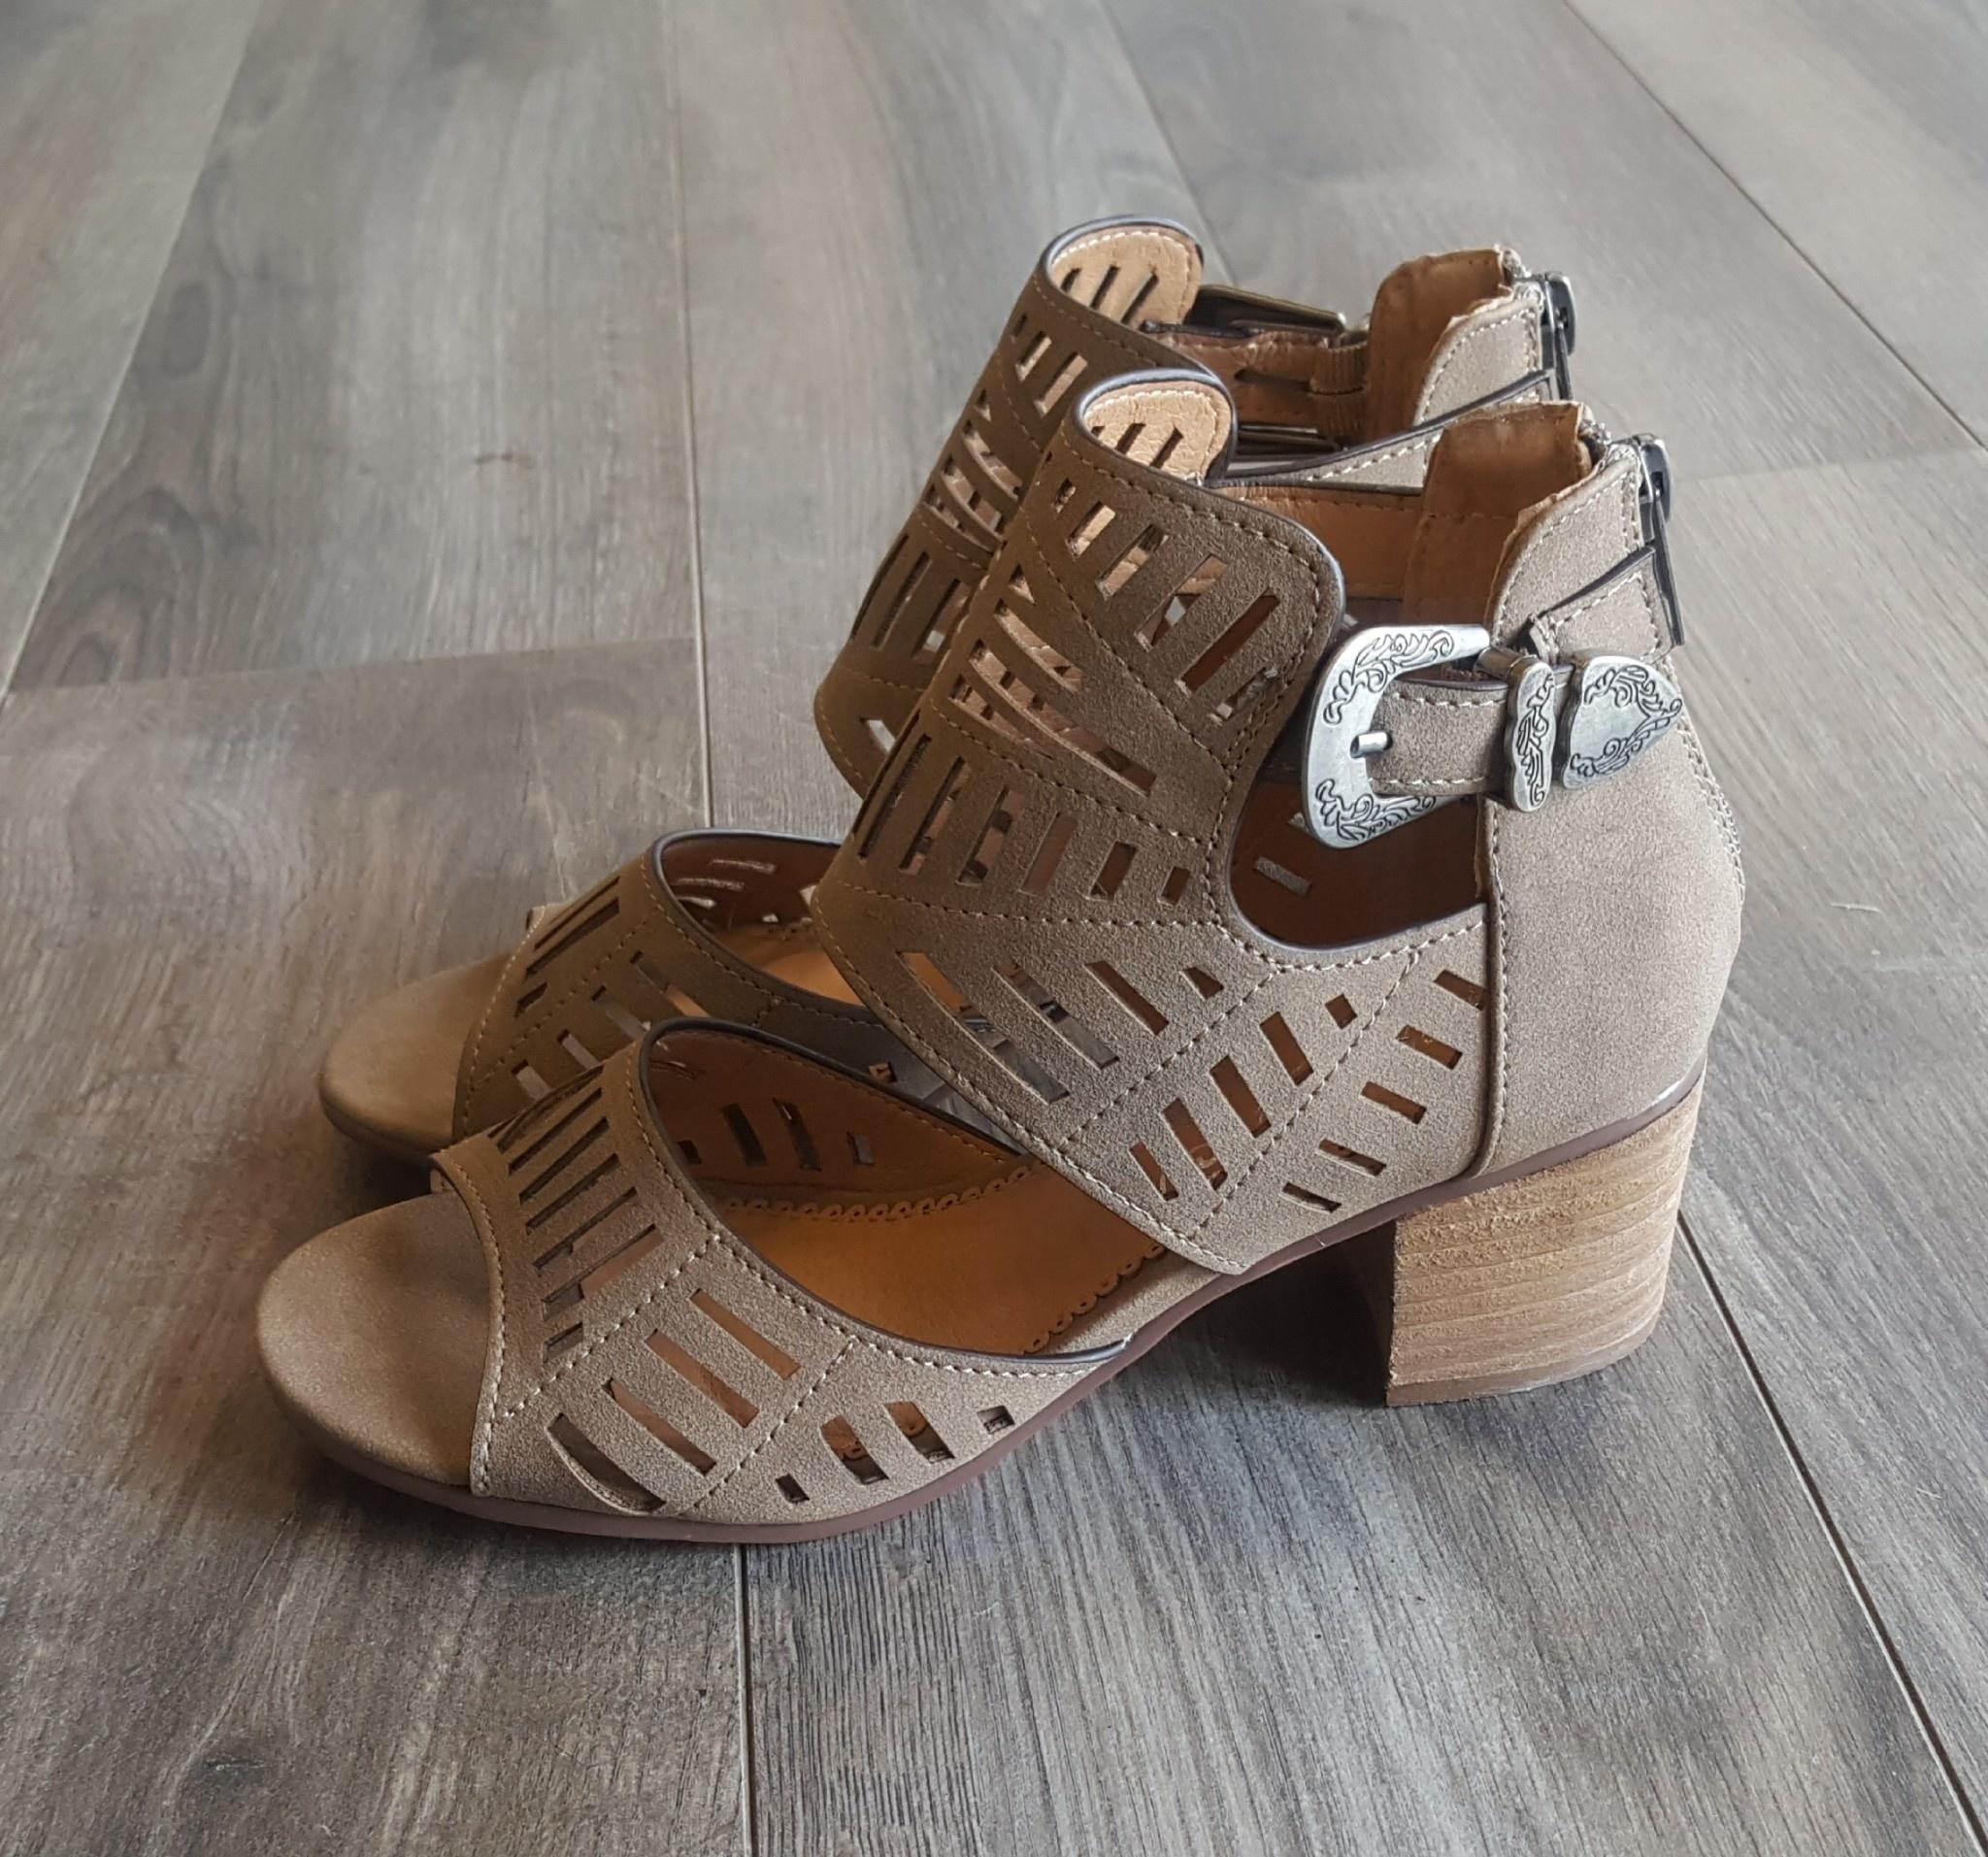 e3274121c33 Abby Heeled Cutout Sandals - Boutique 23